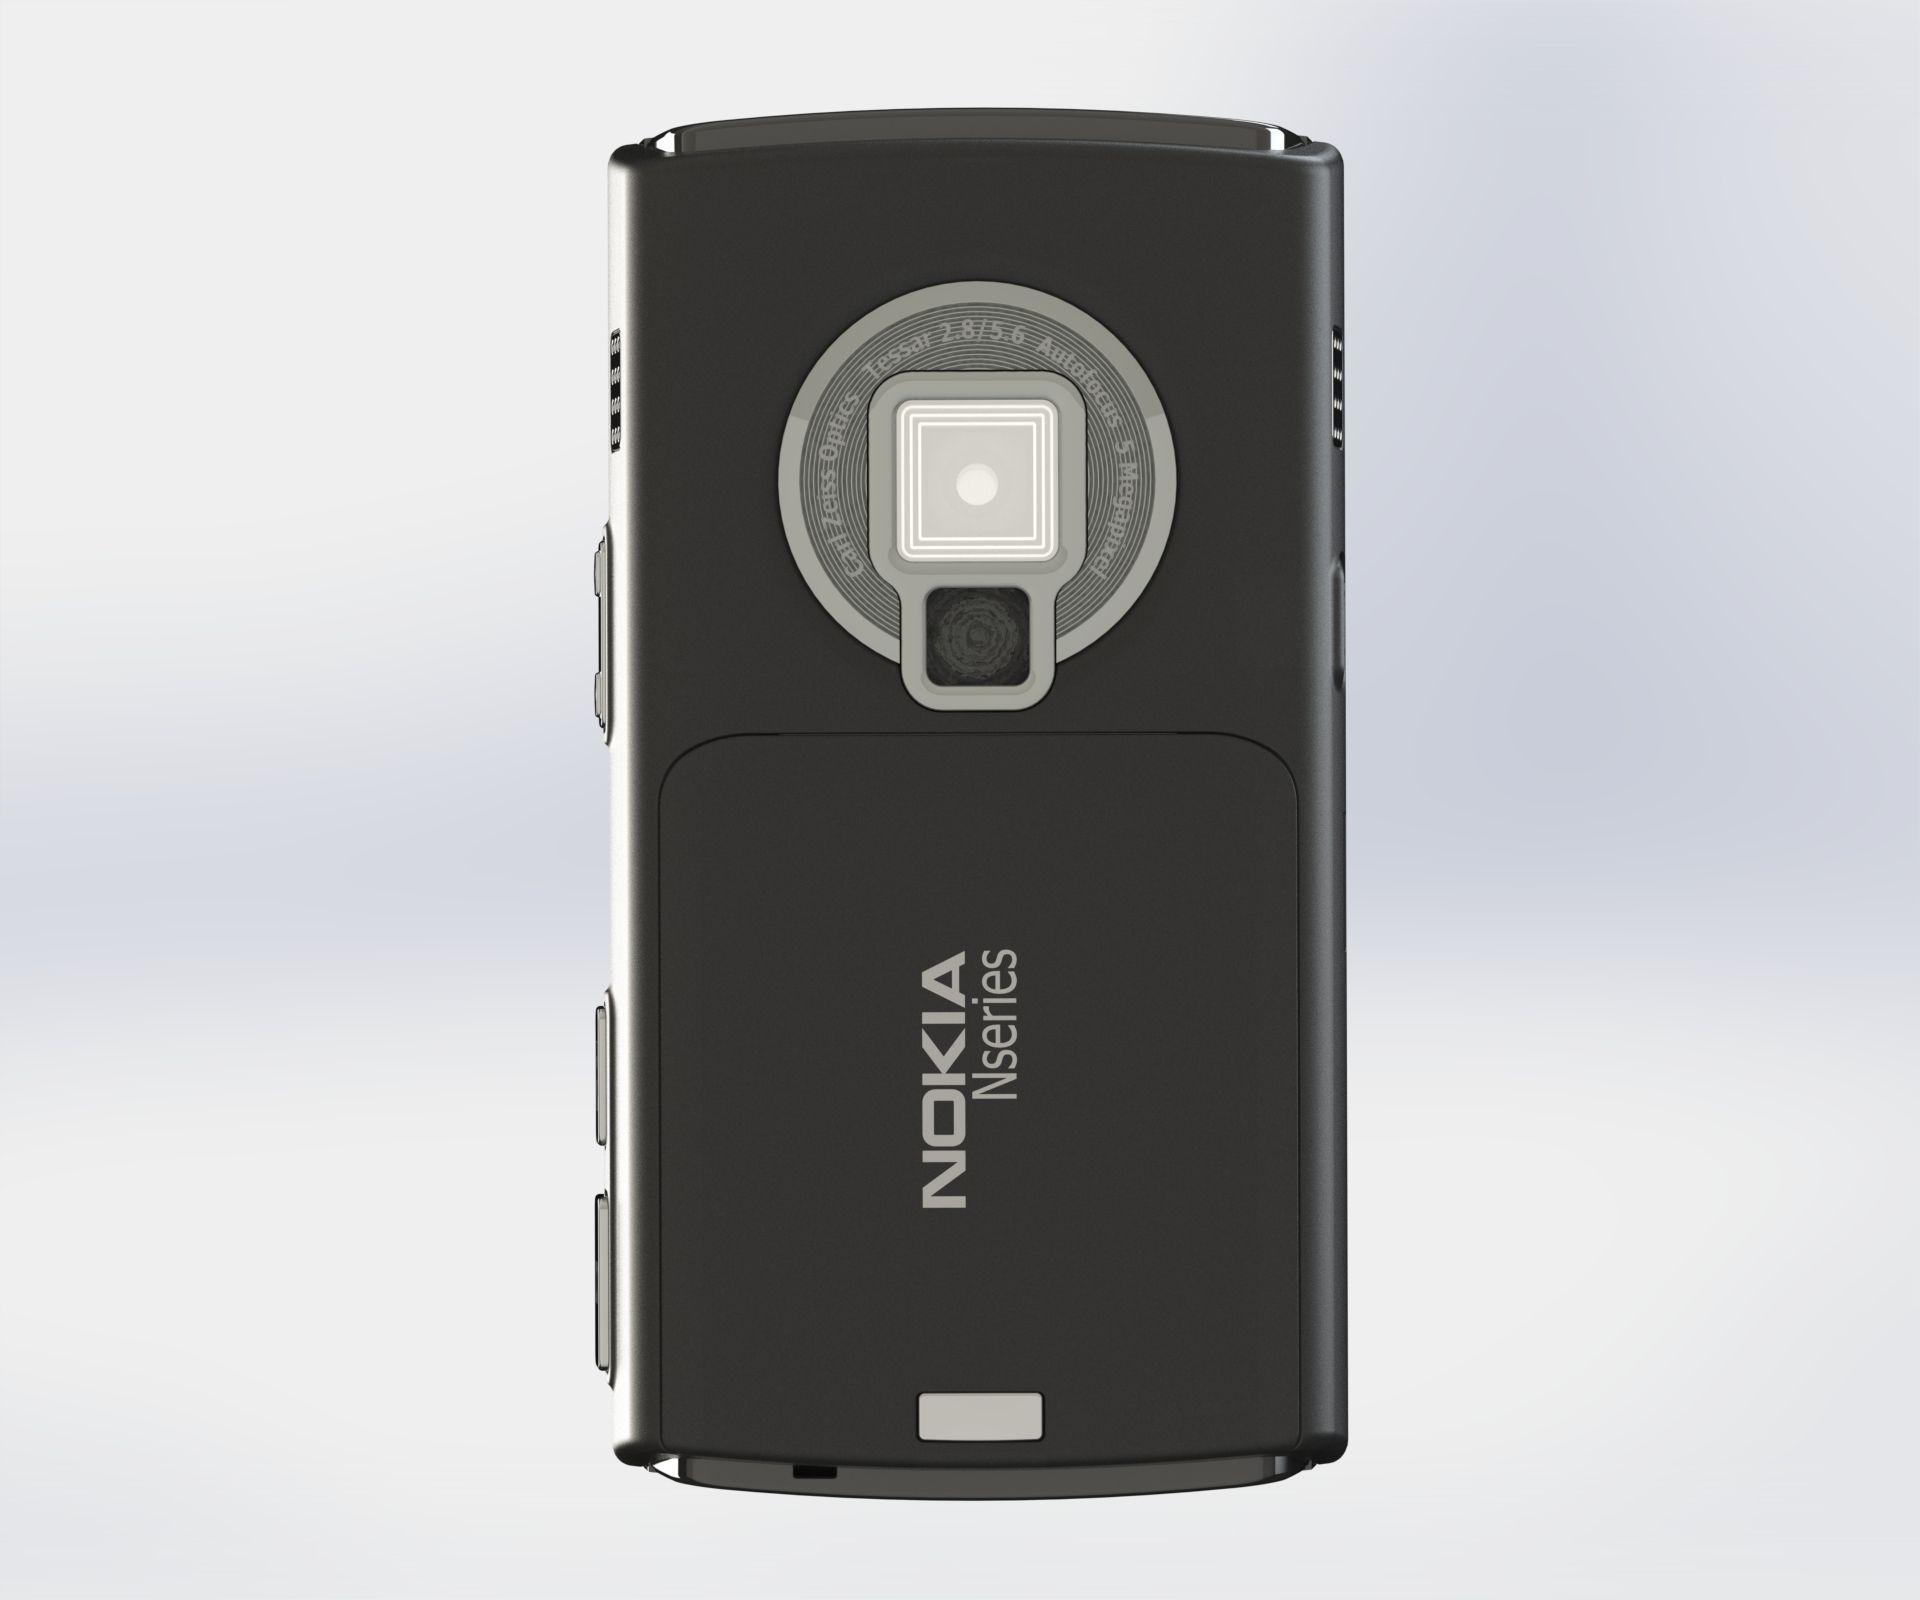 Nokia N95 8Gb 3D Model MAX OBJ FBX SLDPRT SLDASM SLDDRW ...